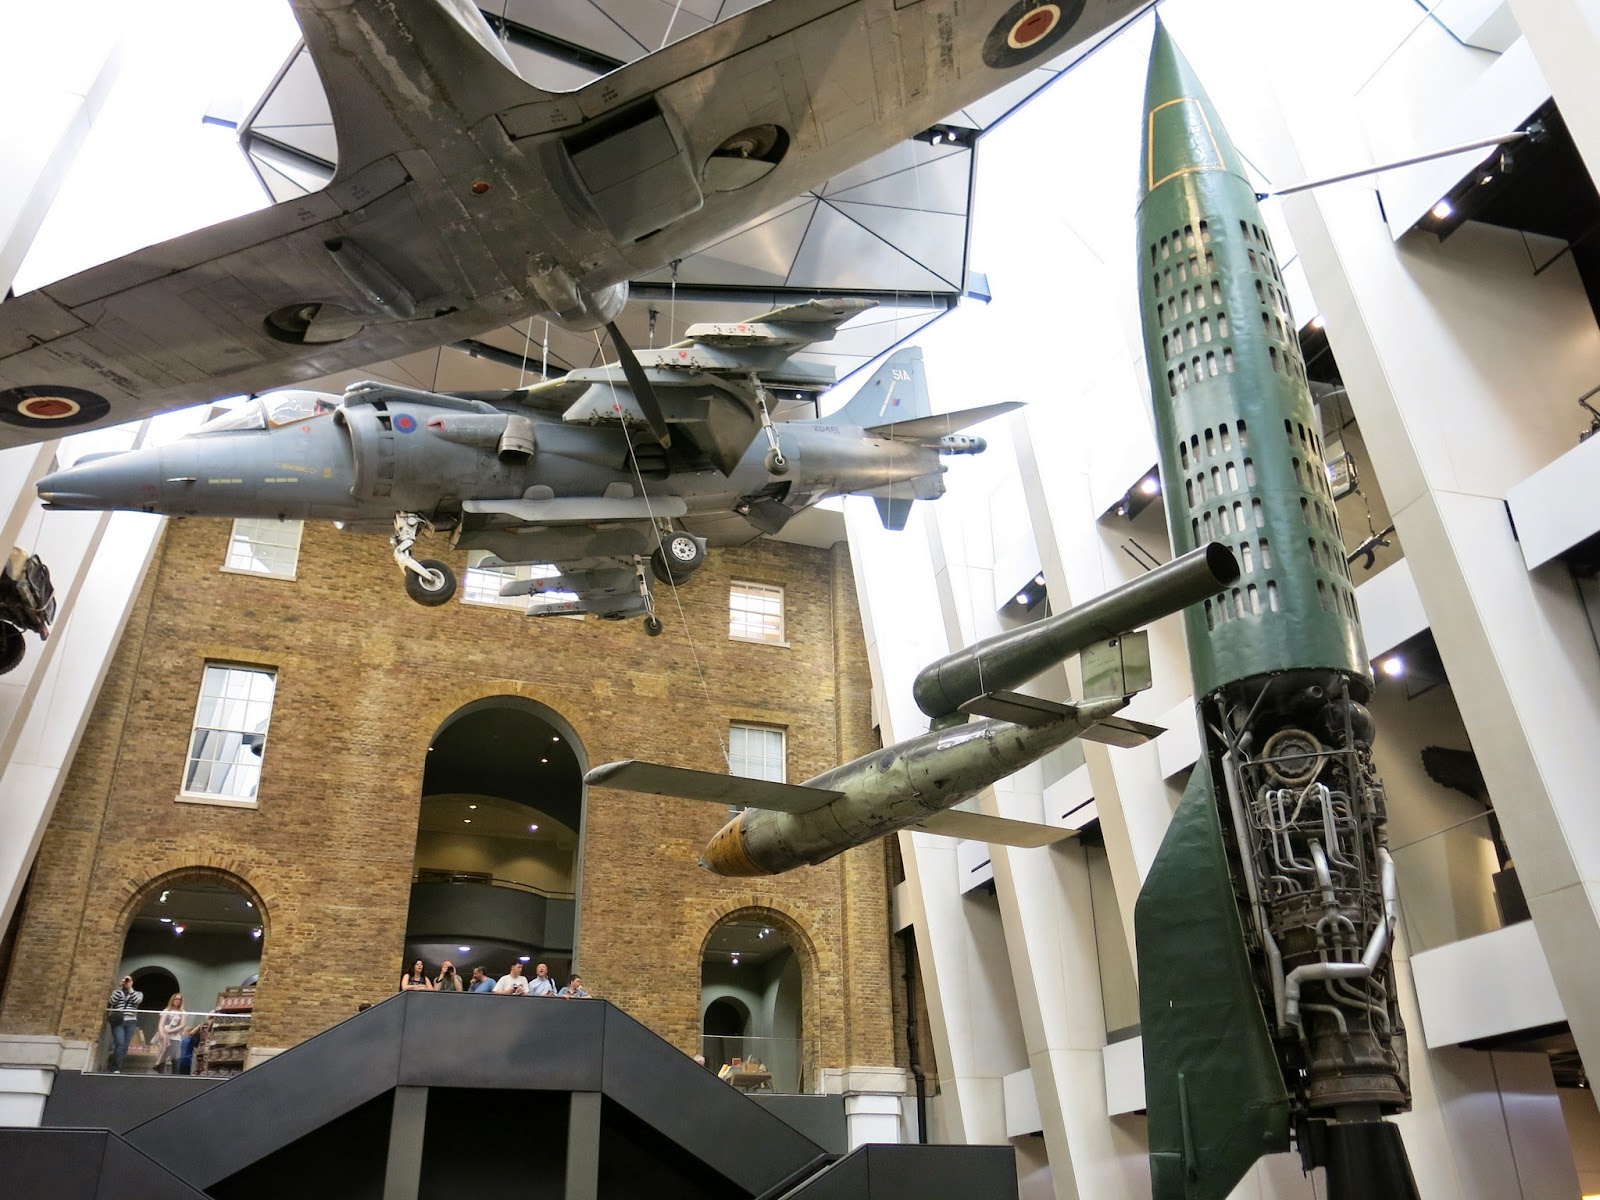 Foyer Museum London : Imperial war museum london biglee s miniature adventures